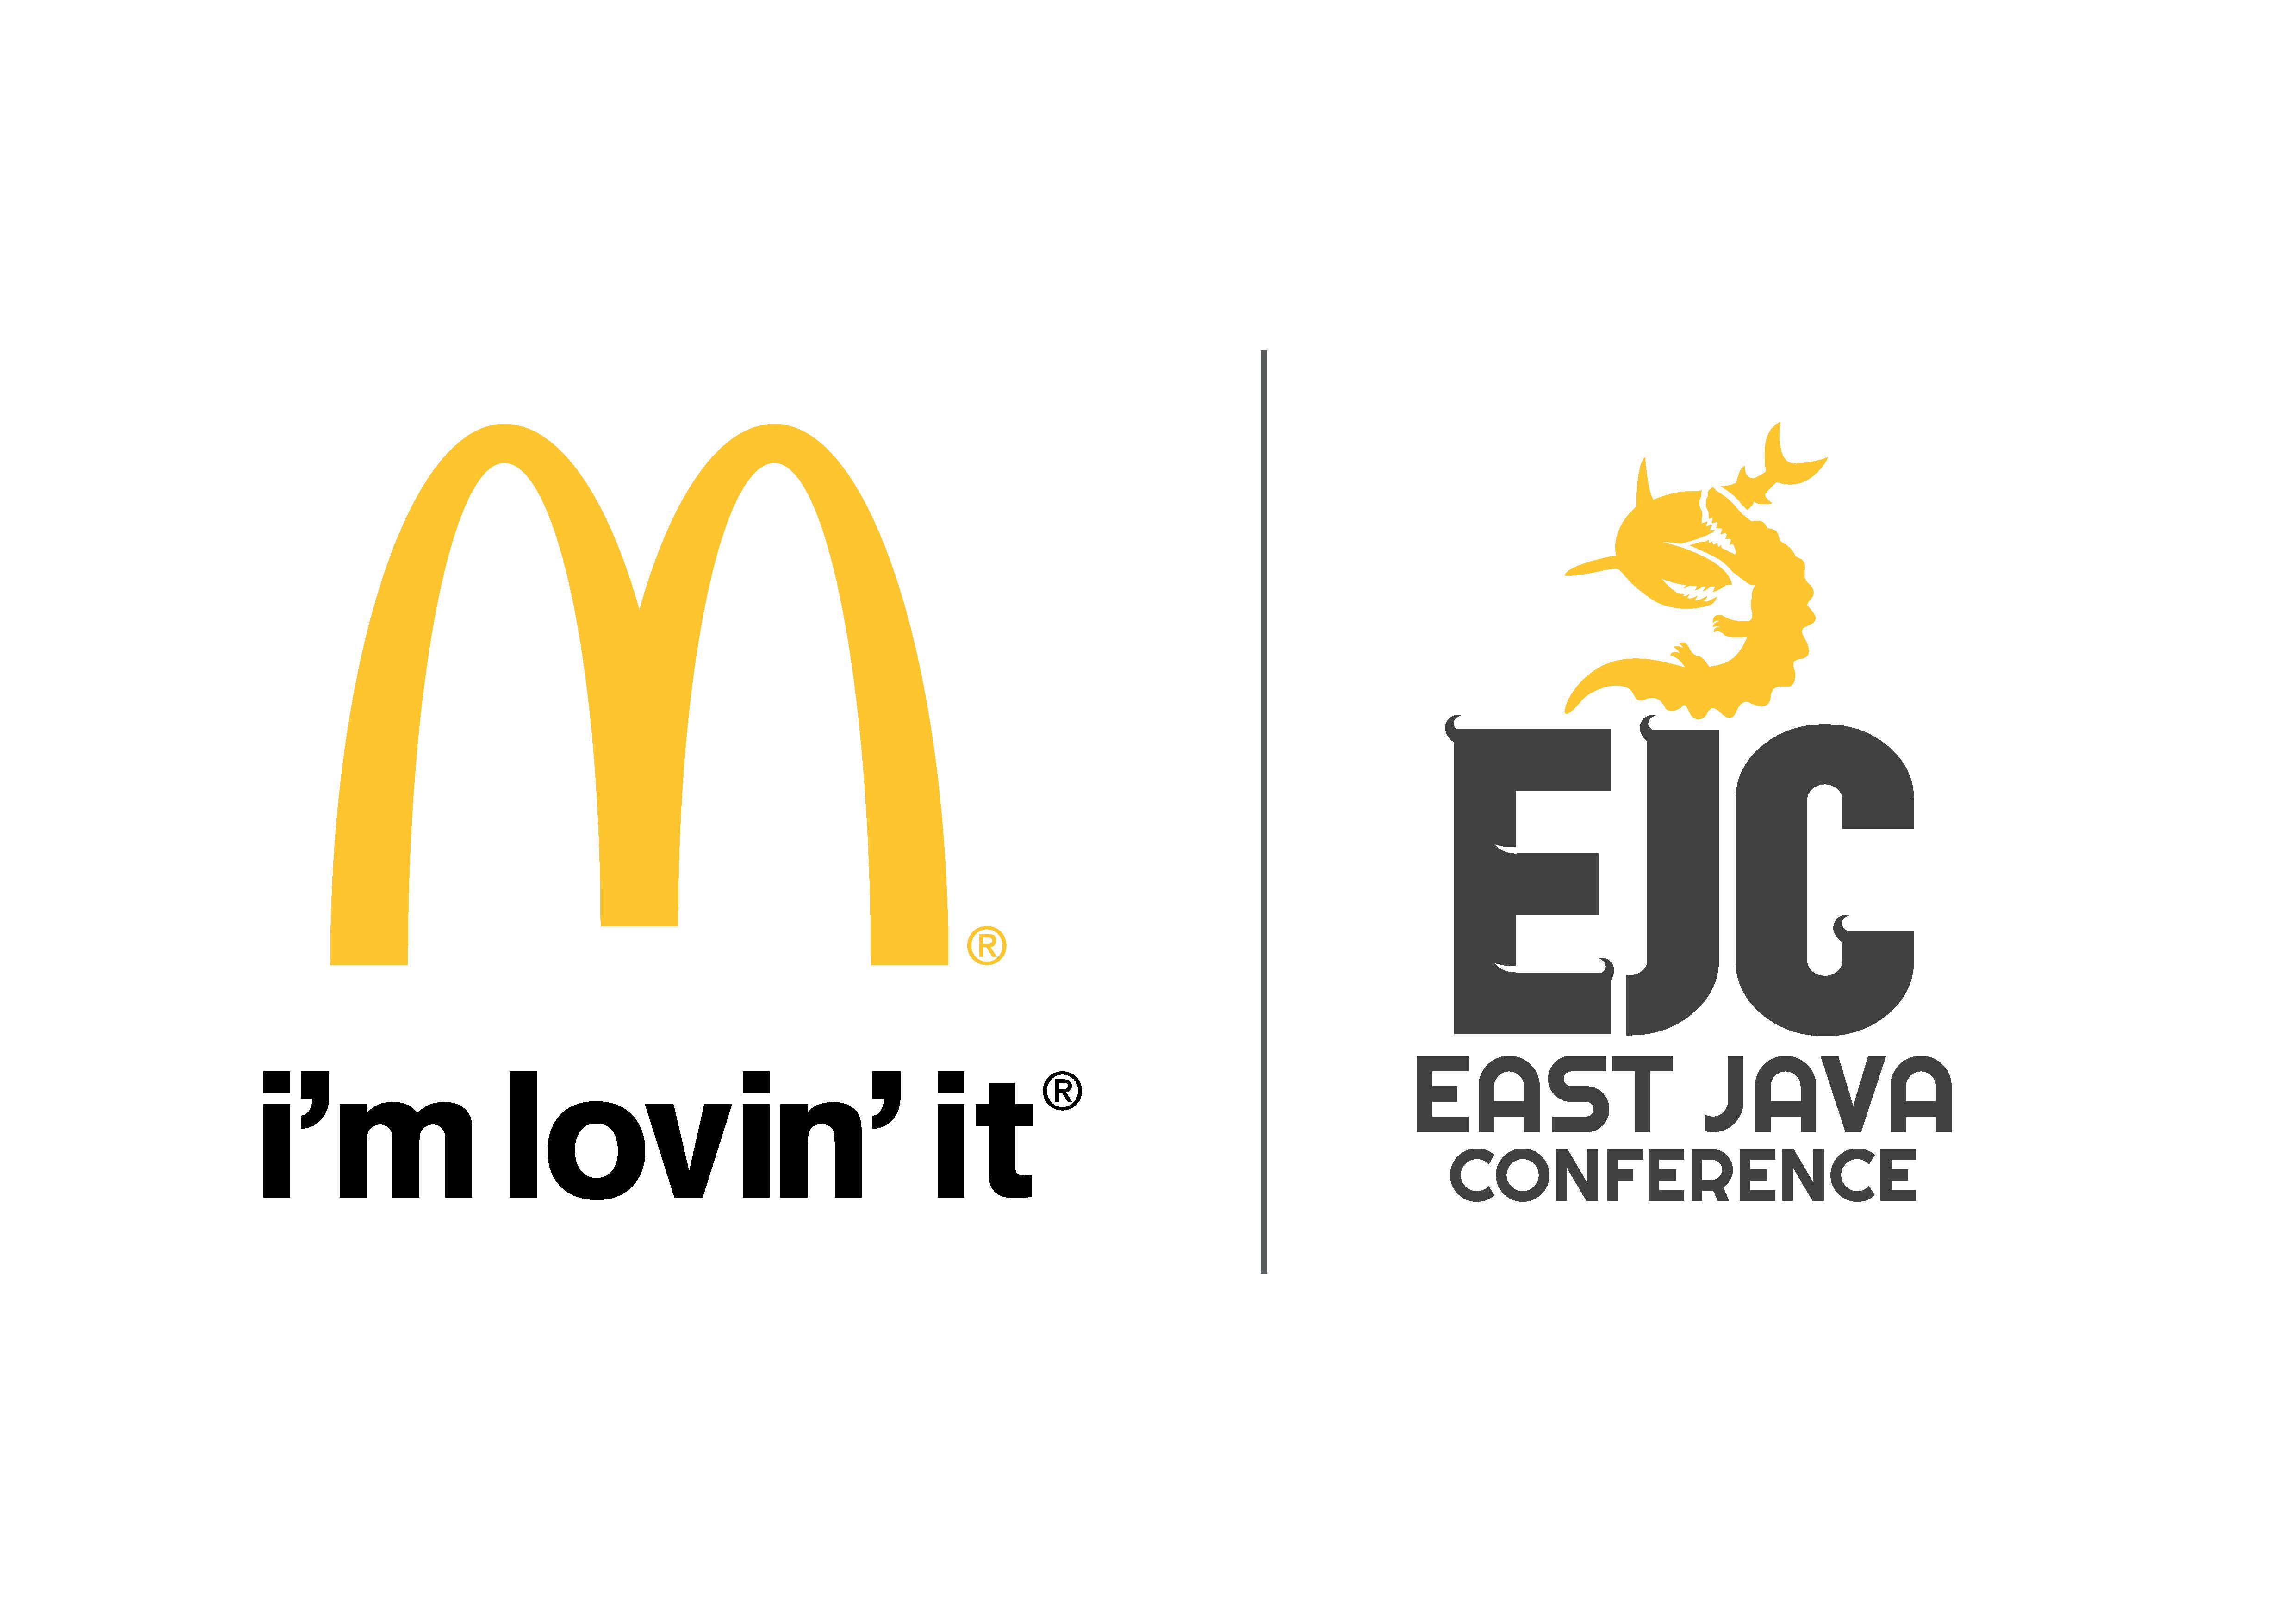 MCDONALD'S EJC